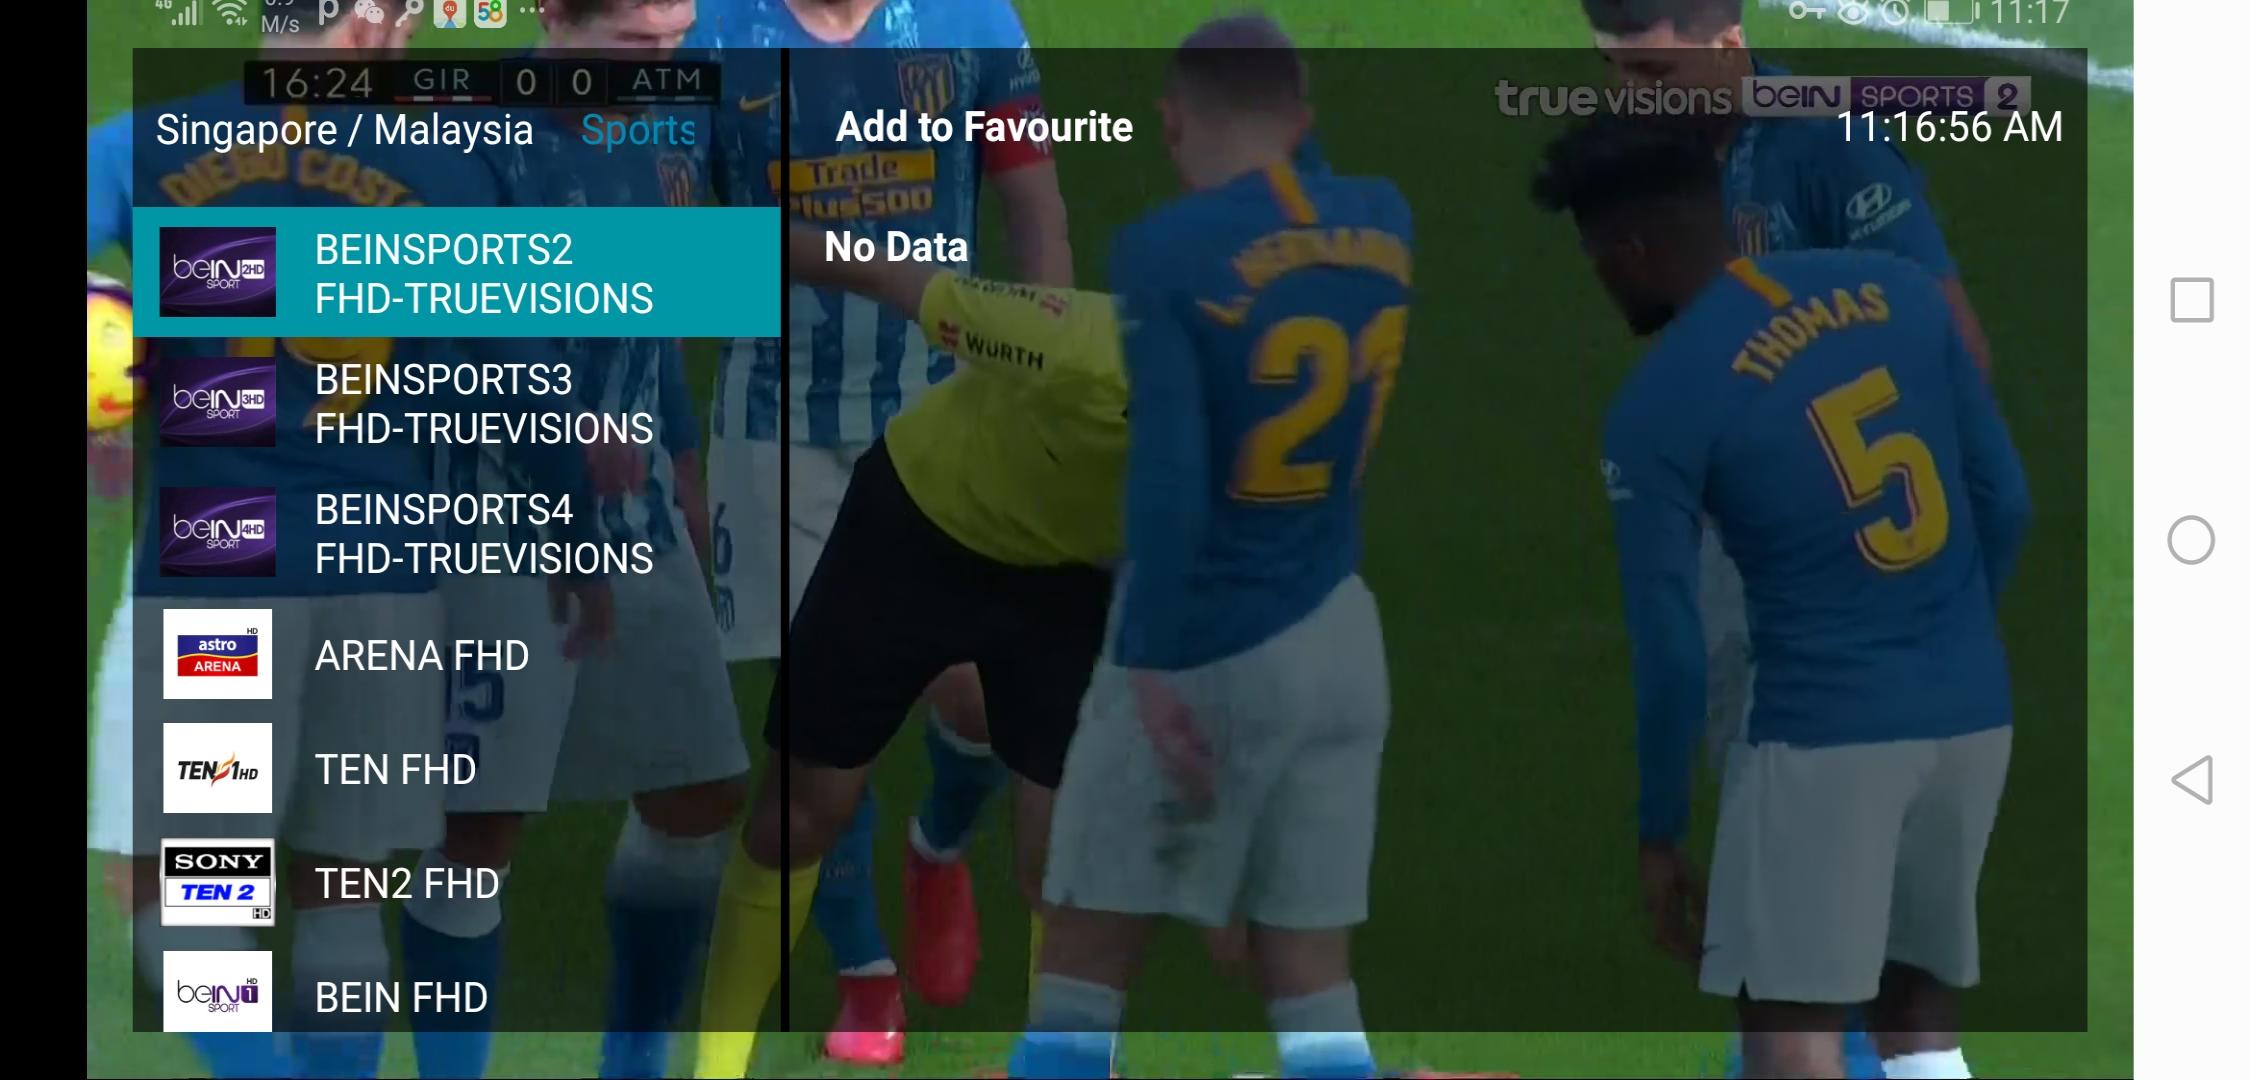 Sport Channels Myiptv 4K Full Languages 500+ Vod Programs